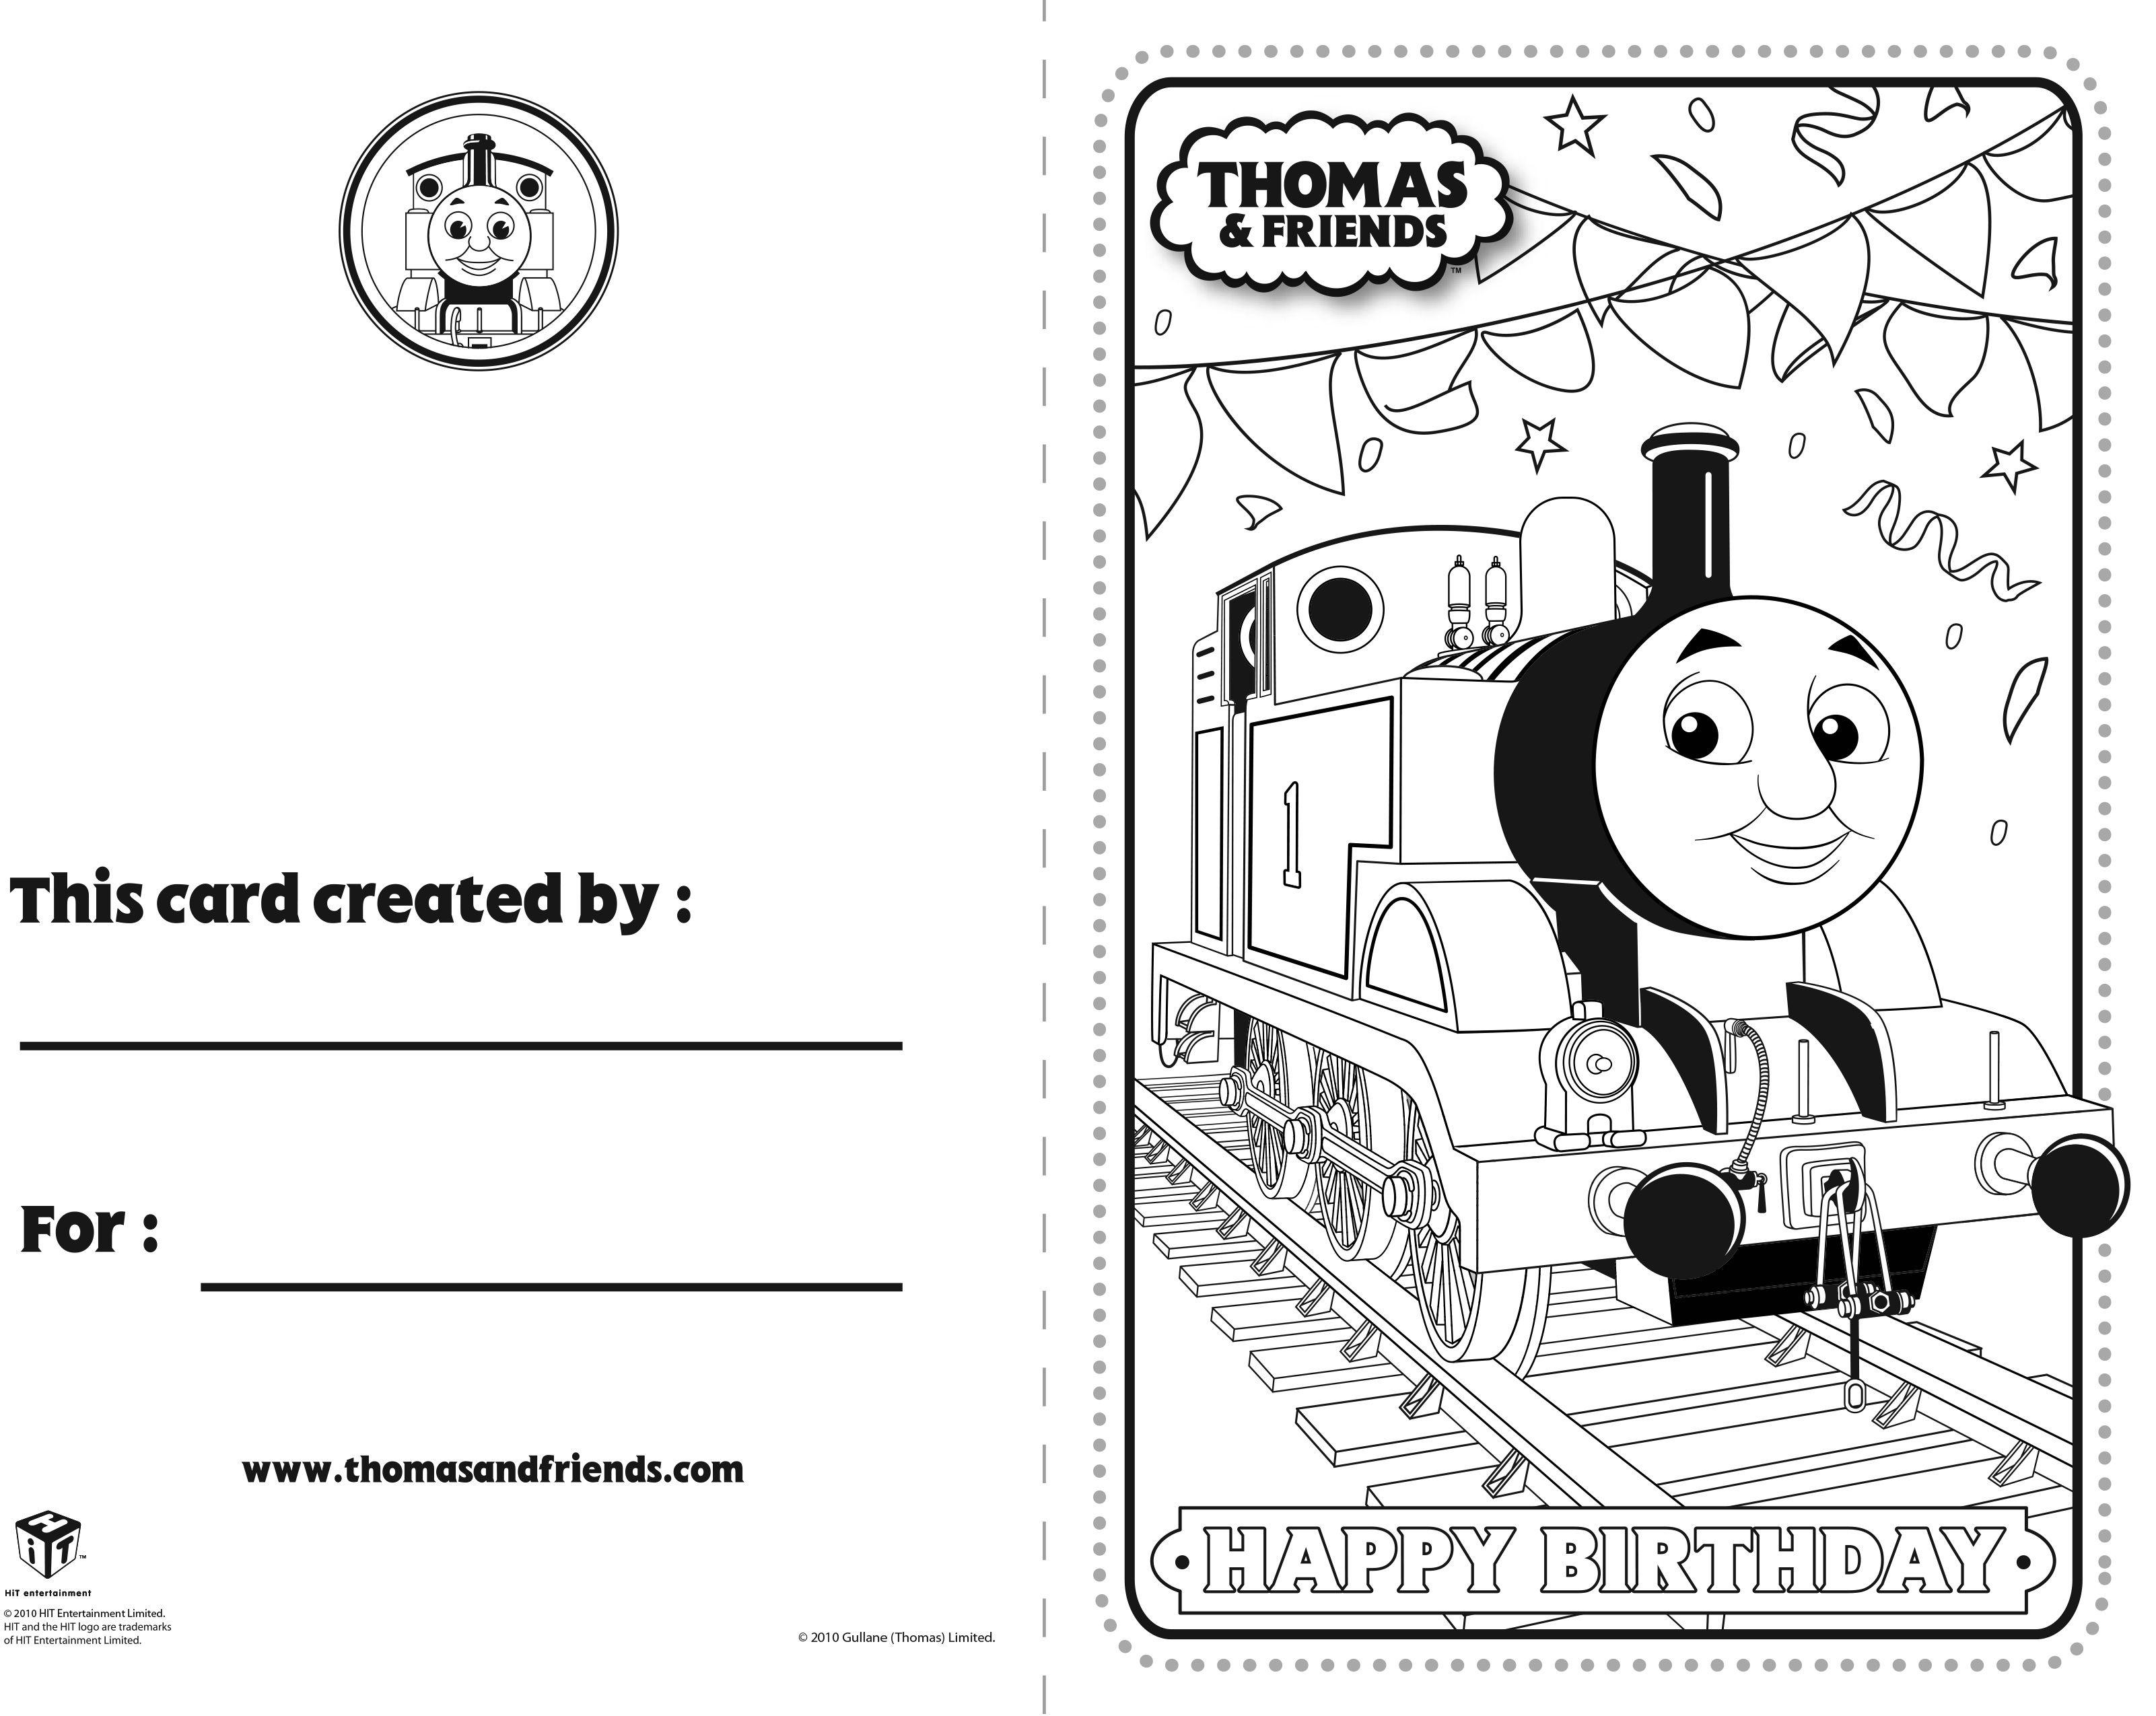 Thomas And Friends Birthday Card Thomas Thomasandfriends Thomasthetankengine Birthda Birthday Coloring Pages Birthday Cards For Friends Thomas And Friends